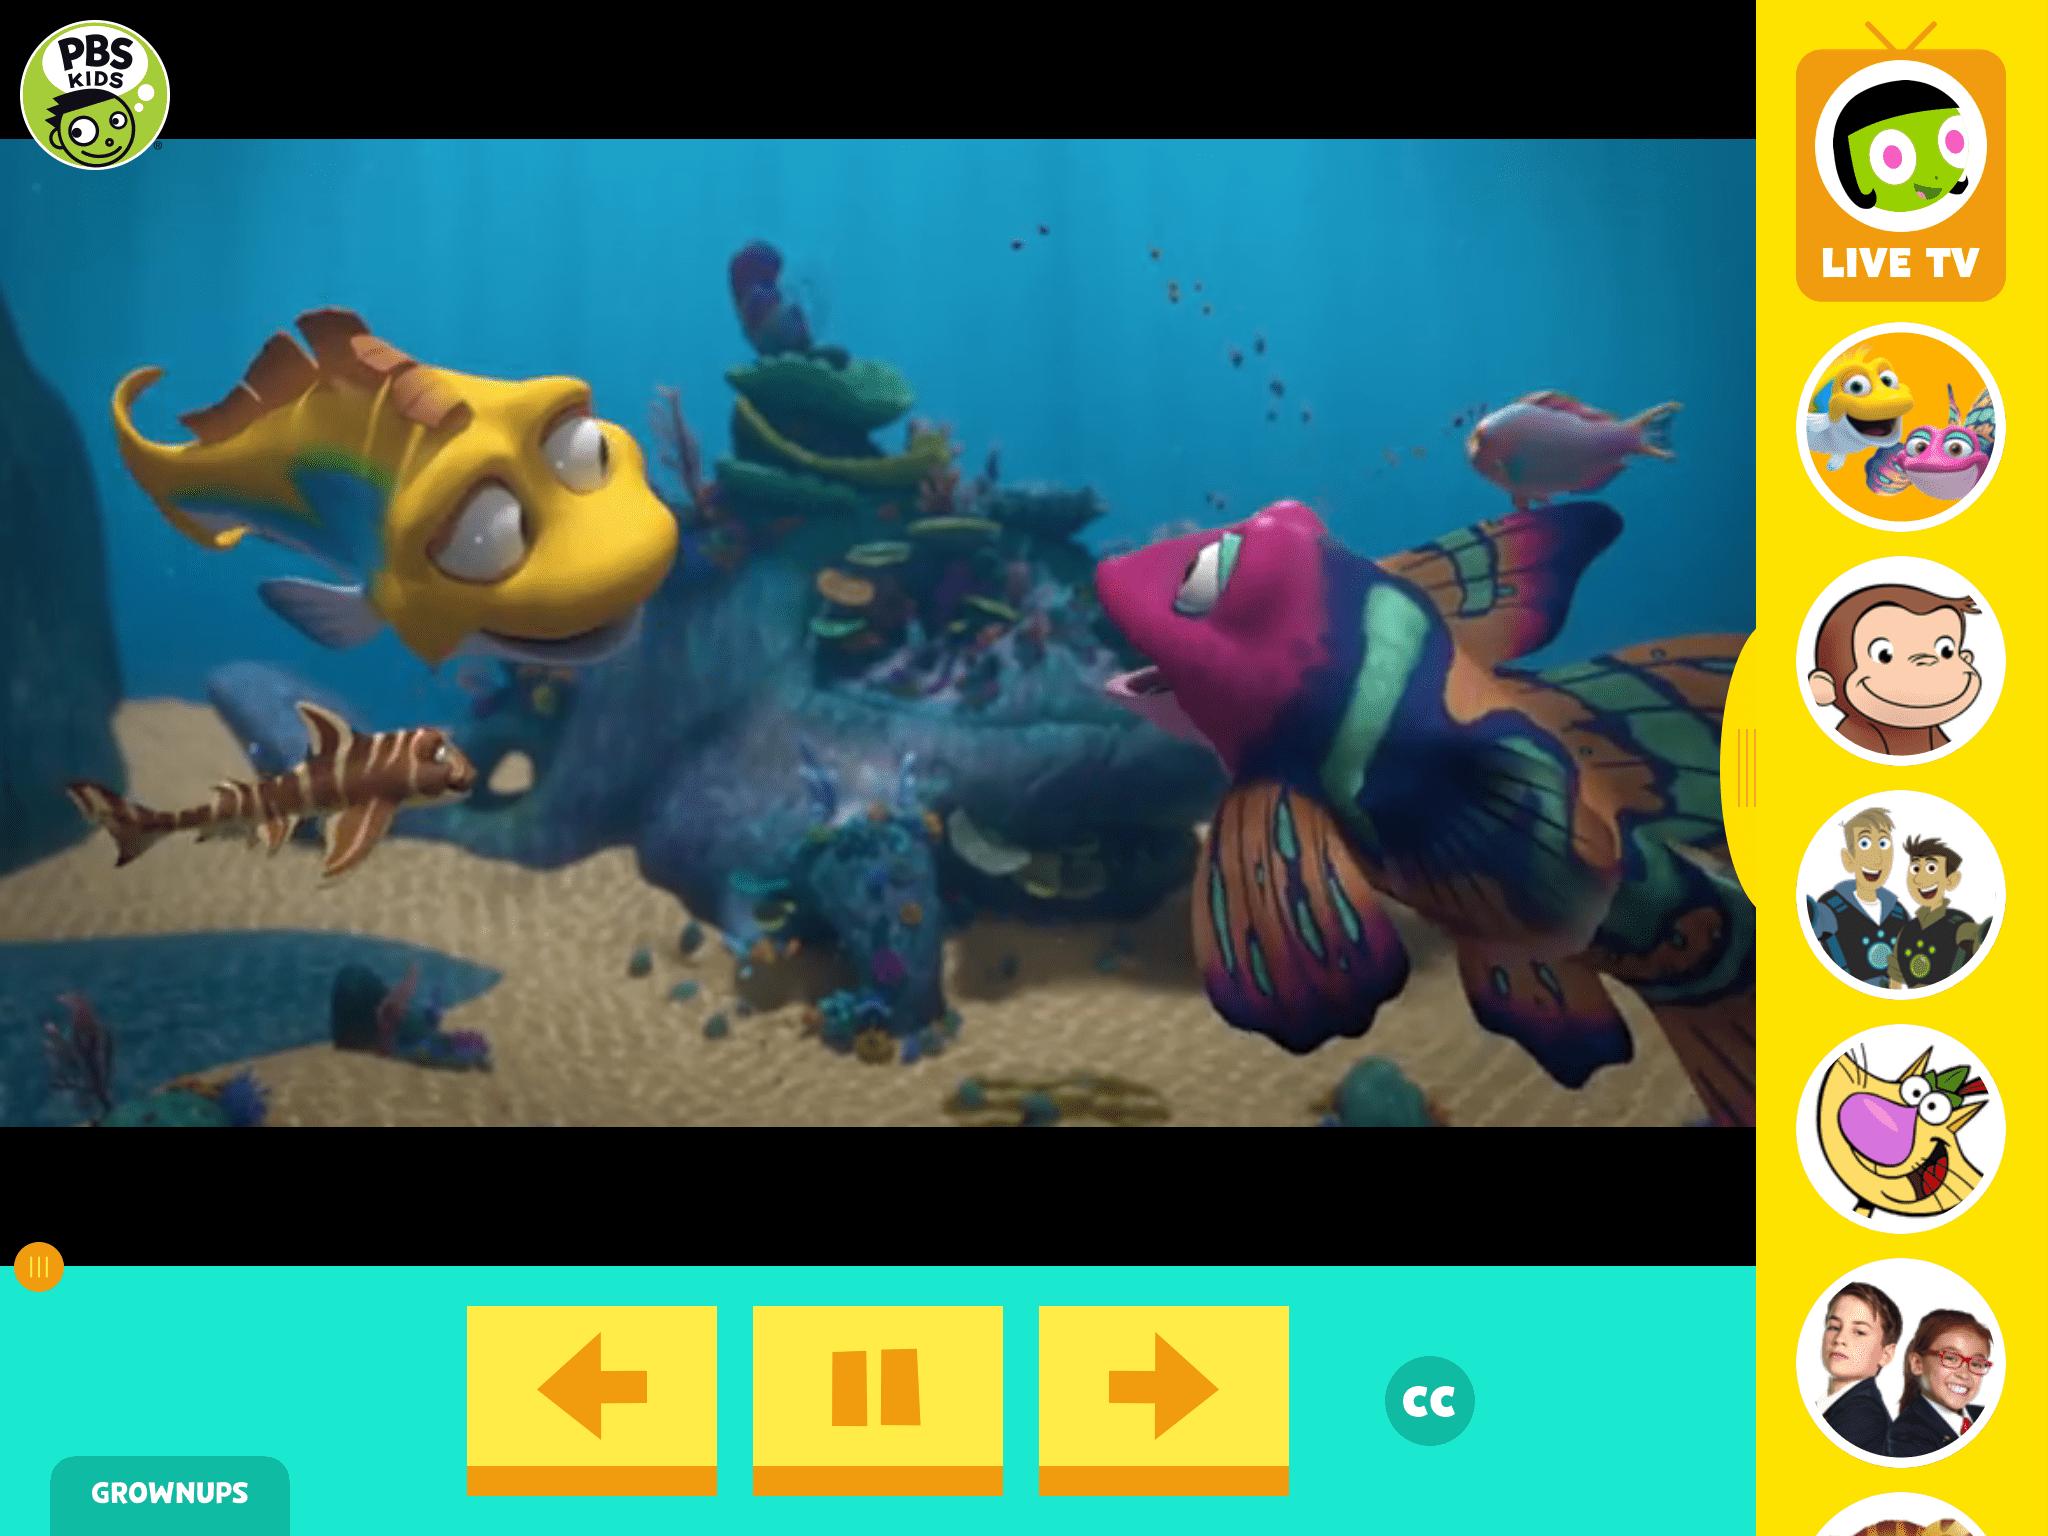 PBS Kids screen